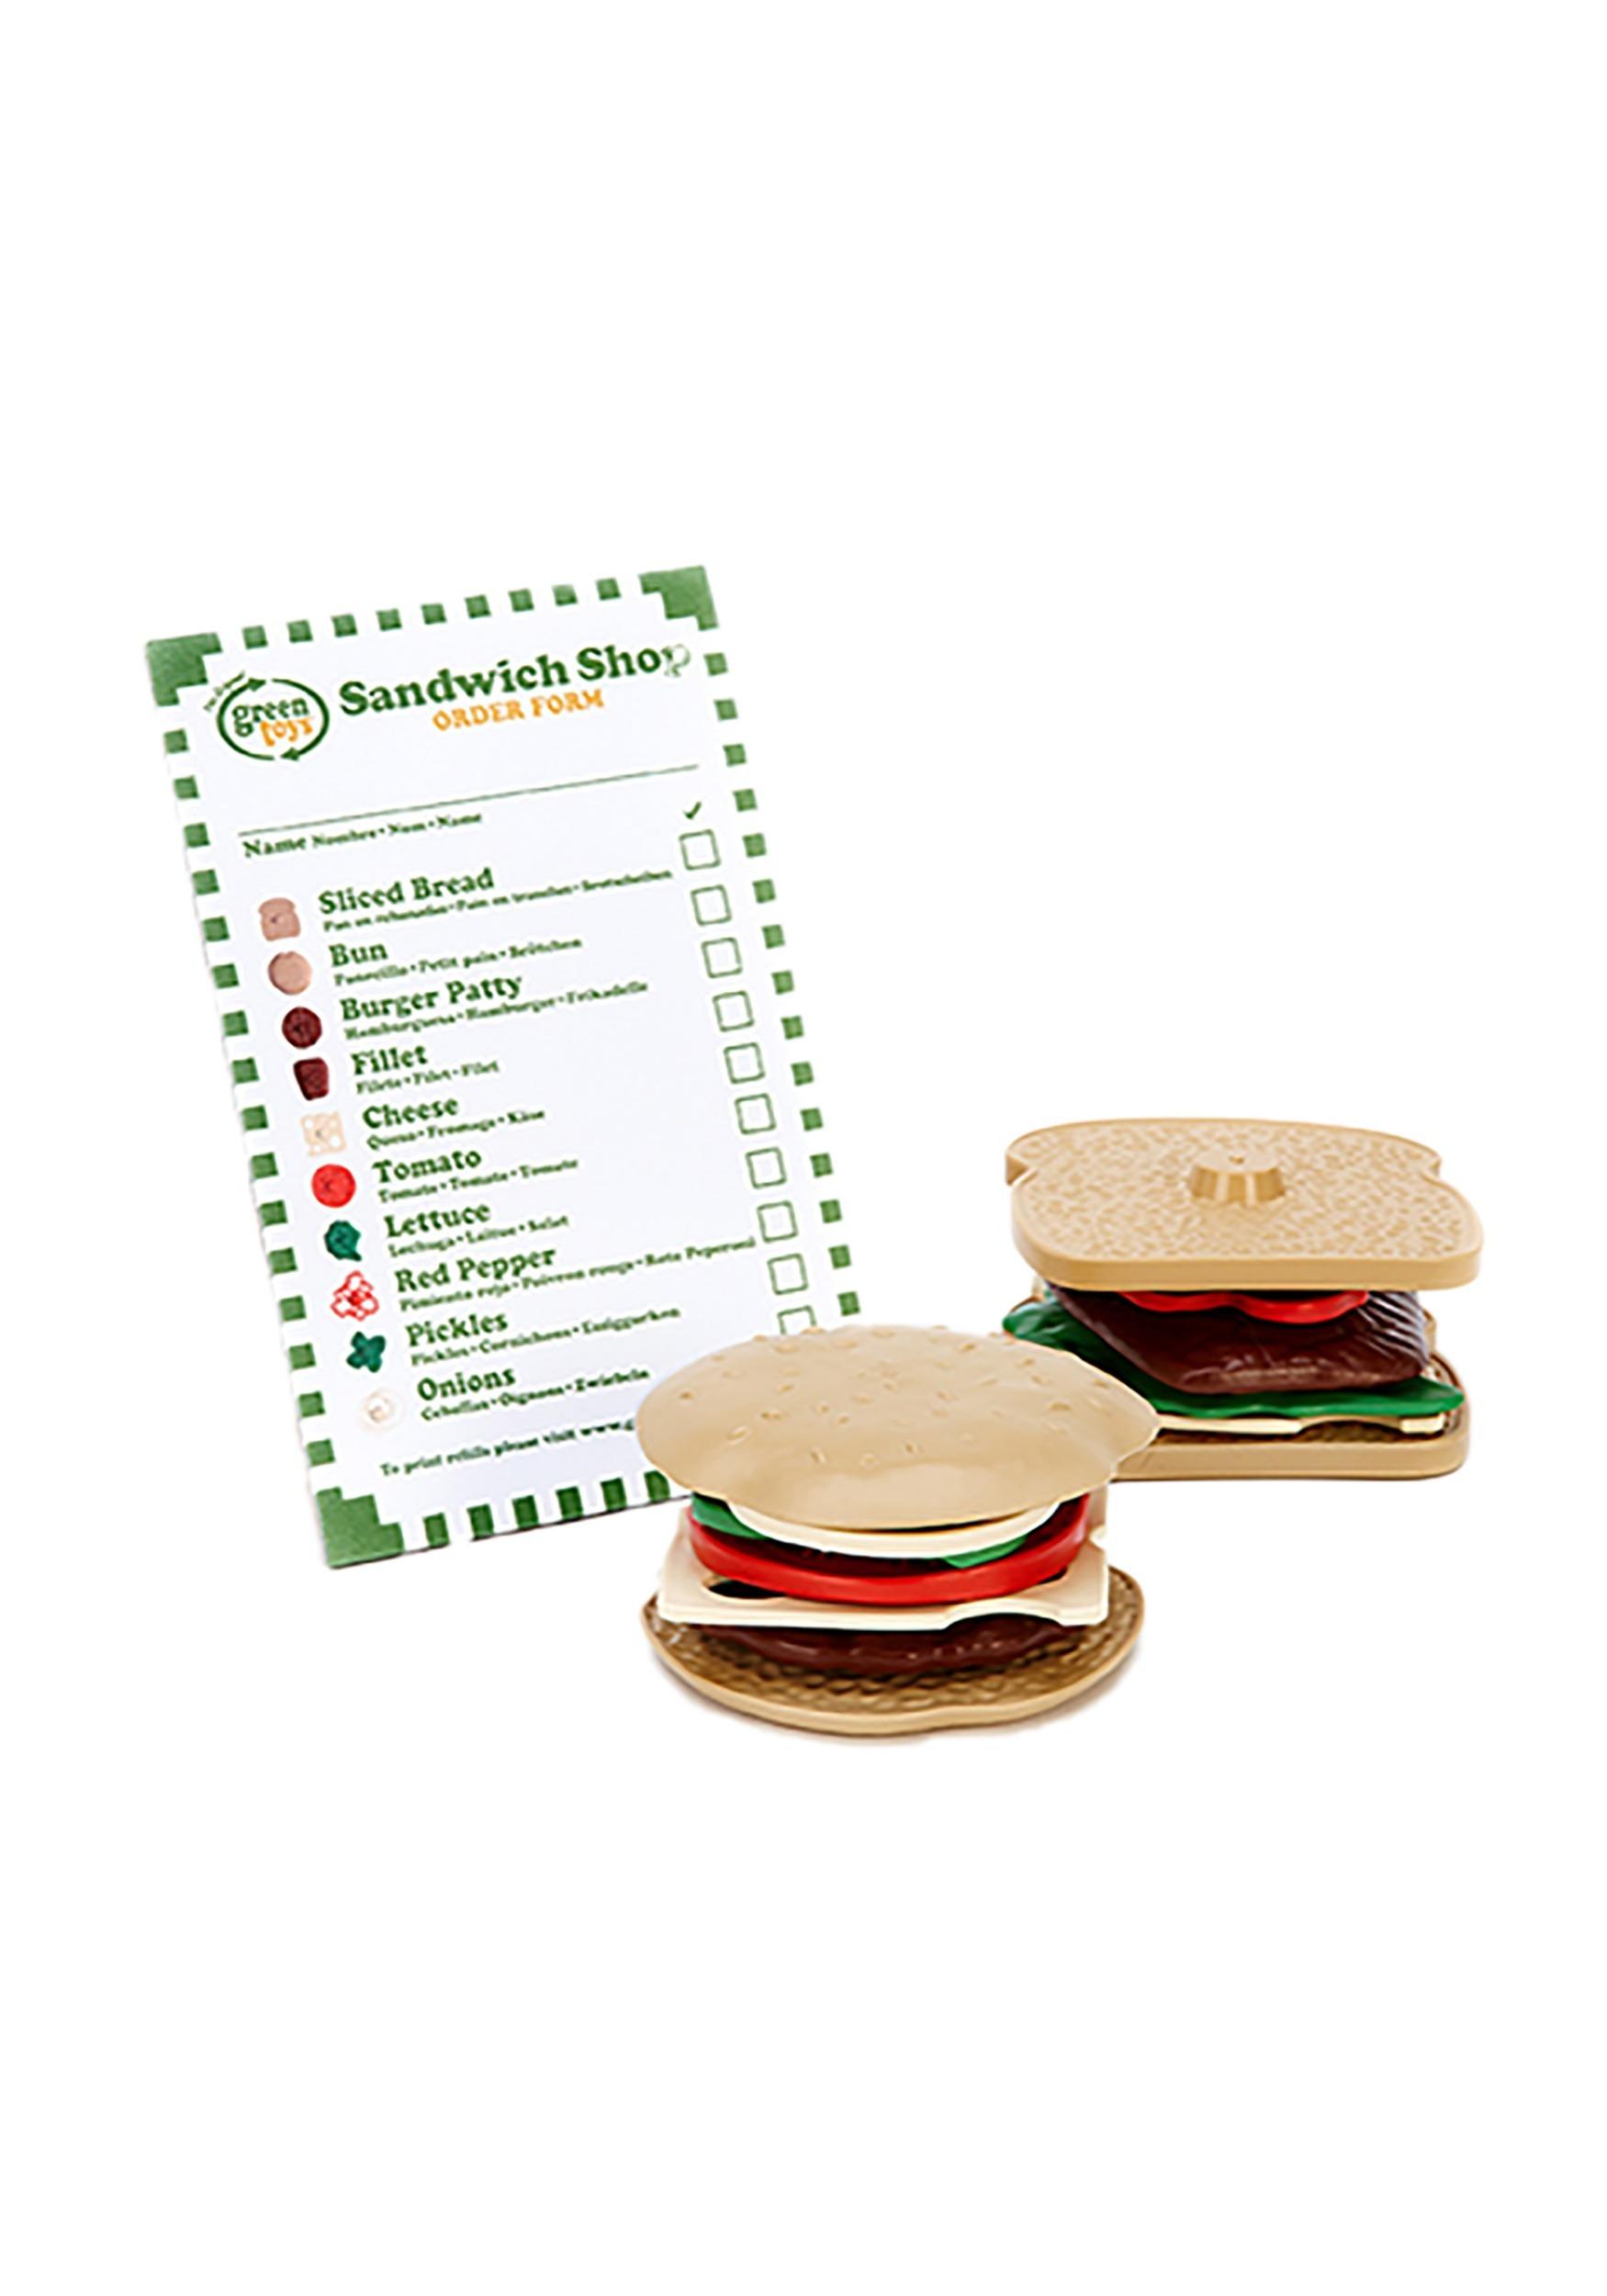 Sandwich Shop Green Toys